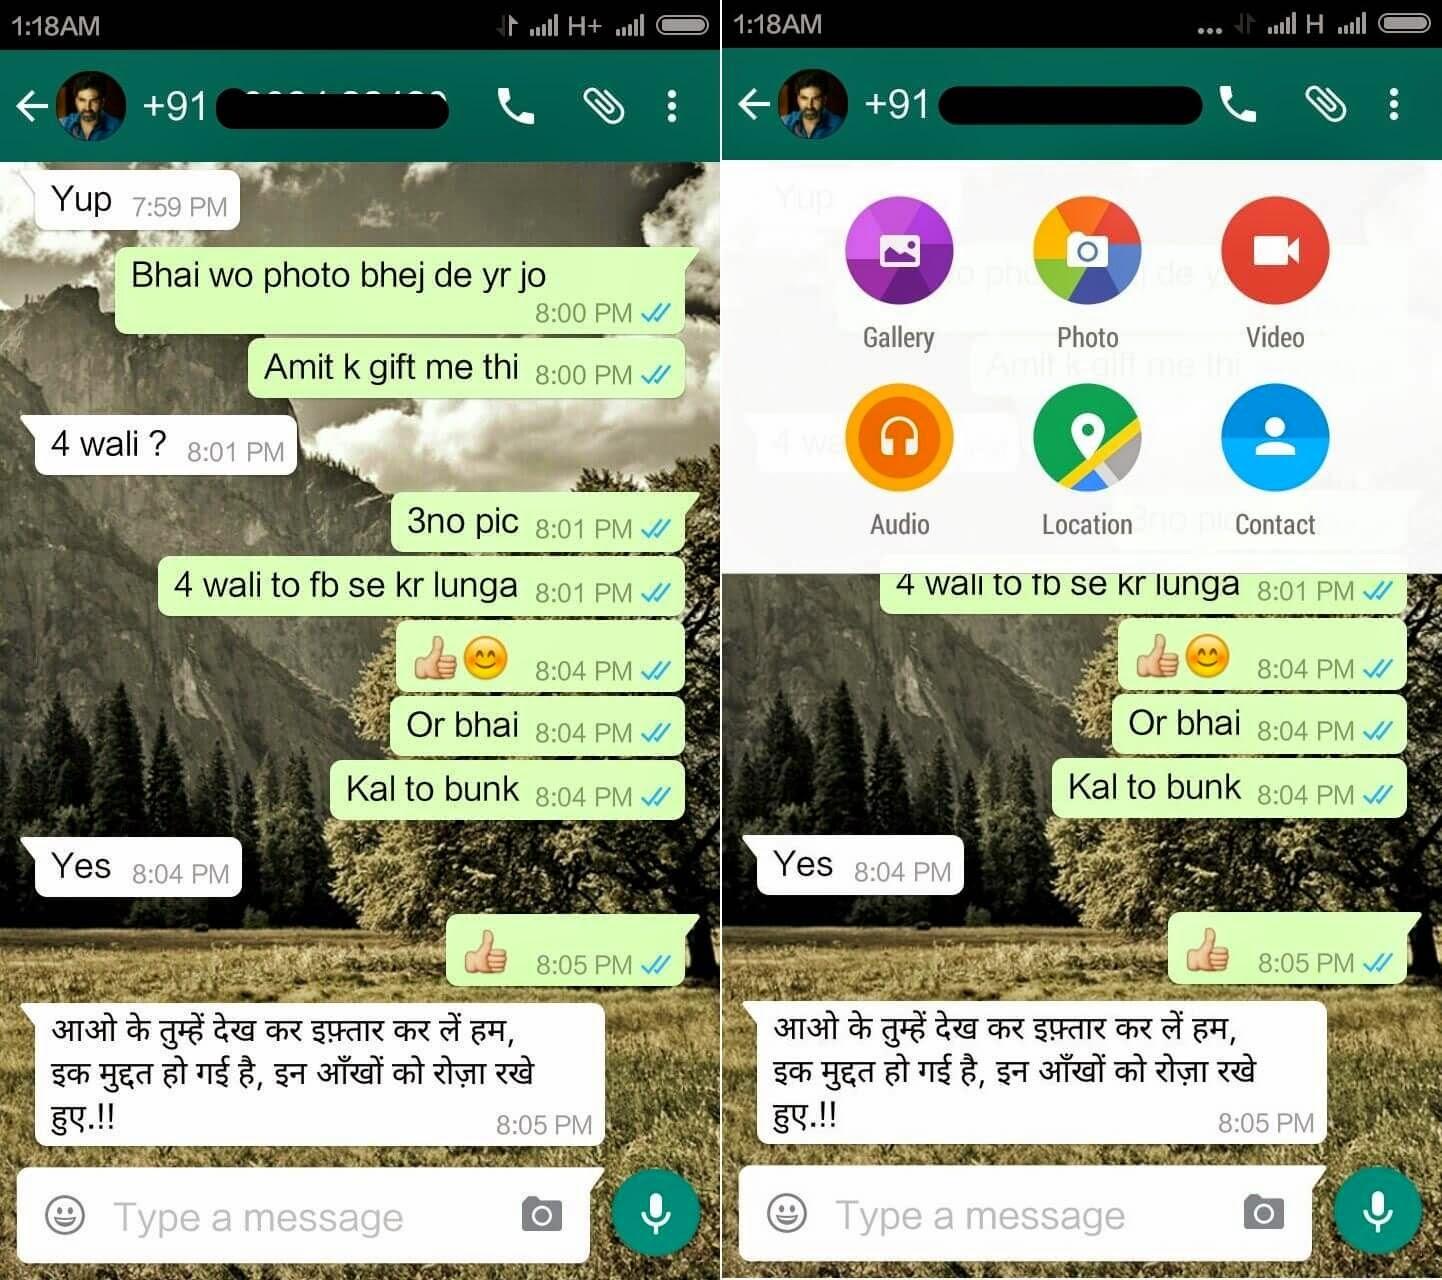 new look of whatsapp 2